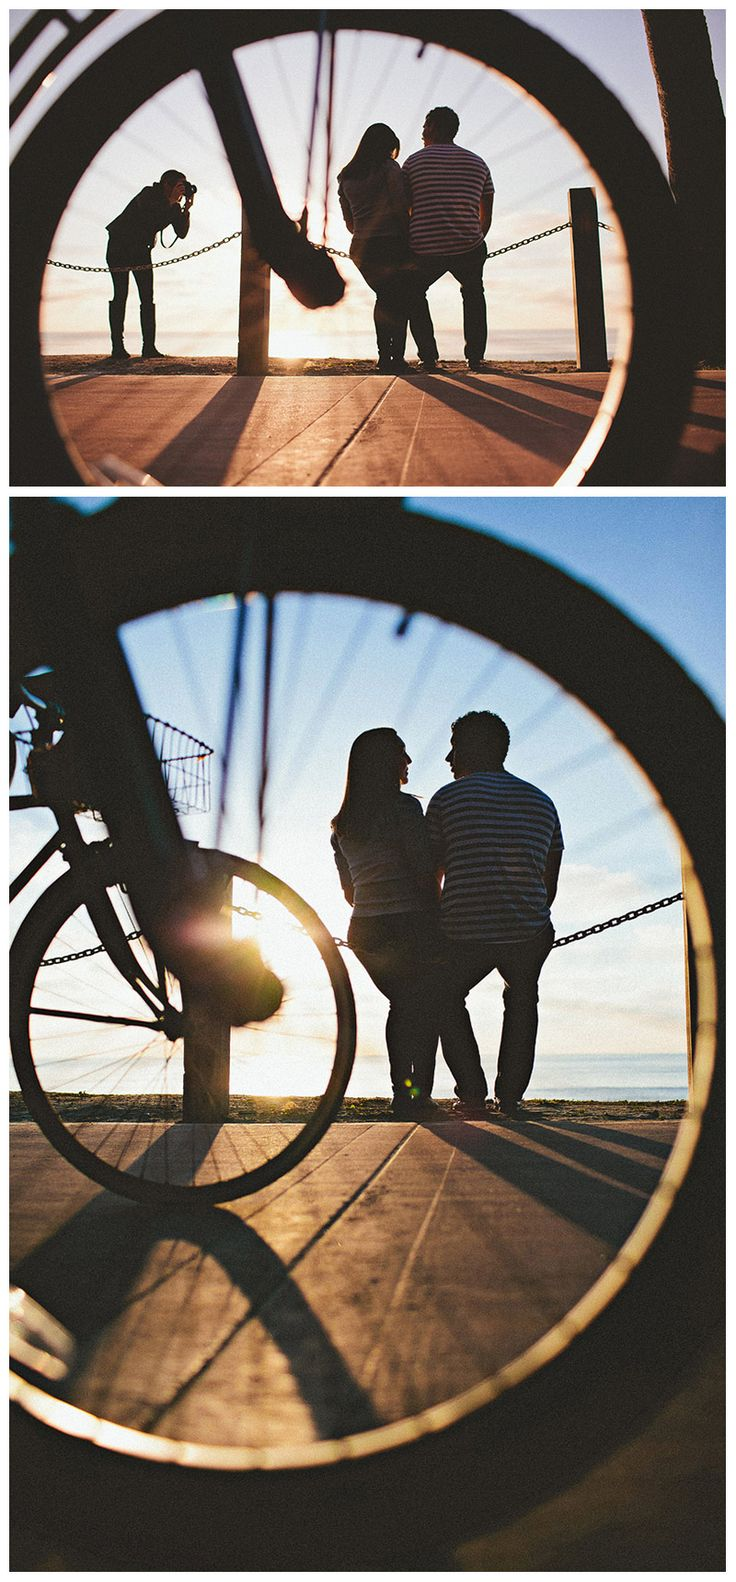 adorable photo through bike wheel